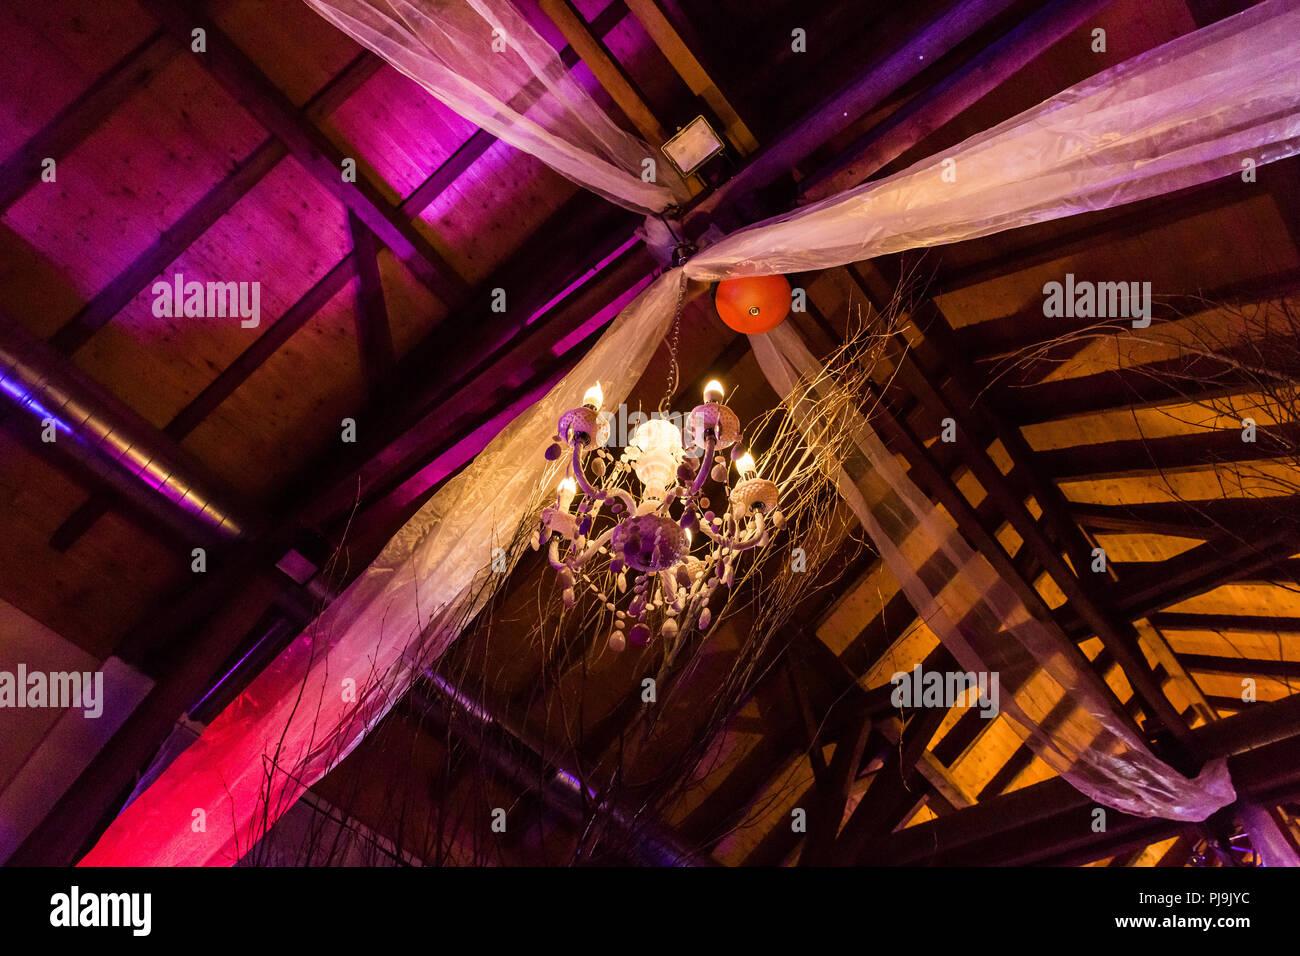 Hanging Chandelier and Tulle Wedding Lighting Stock Photo